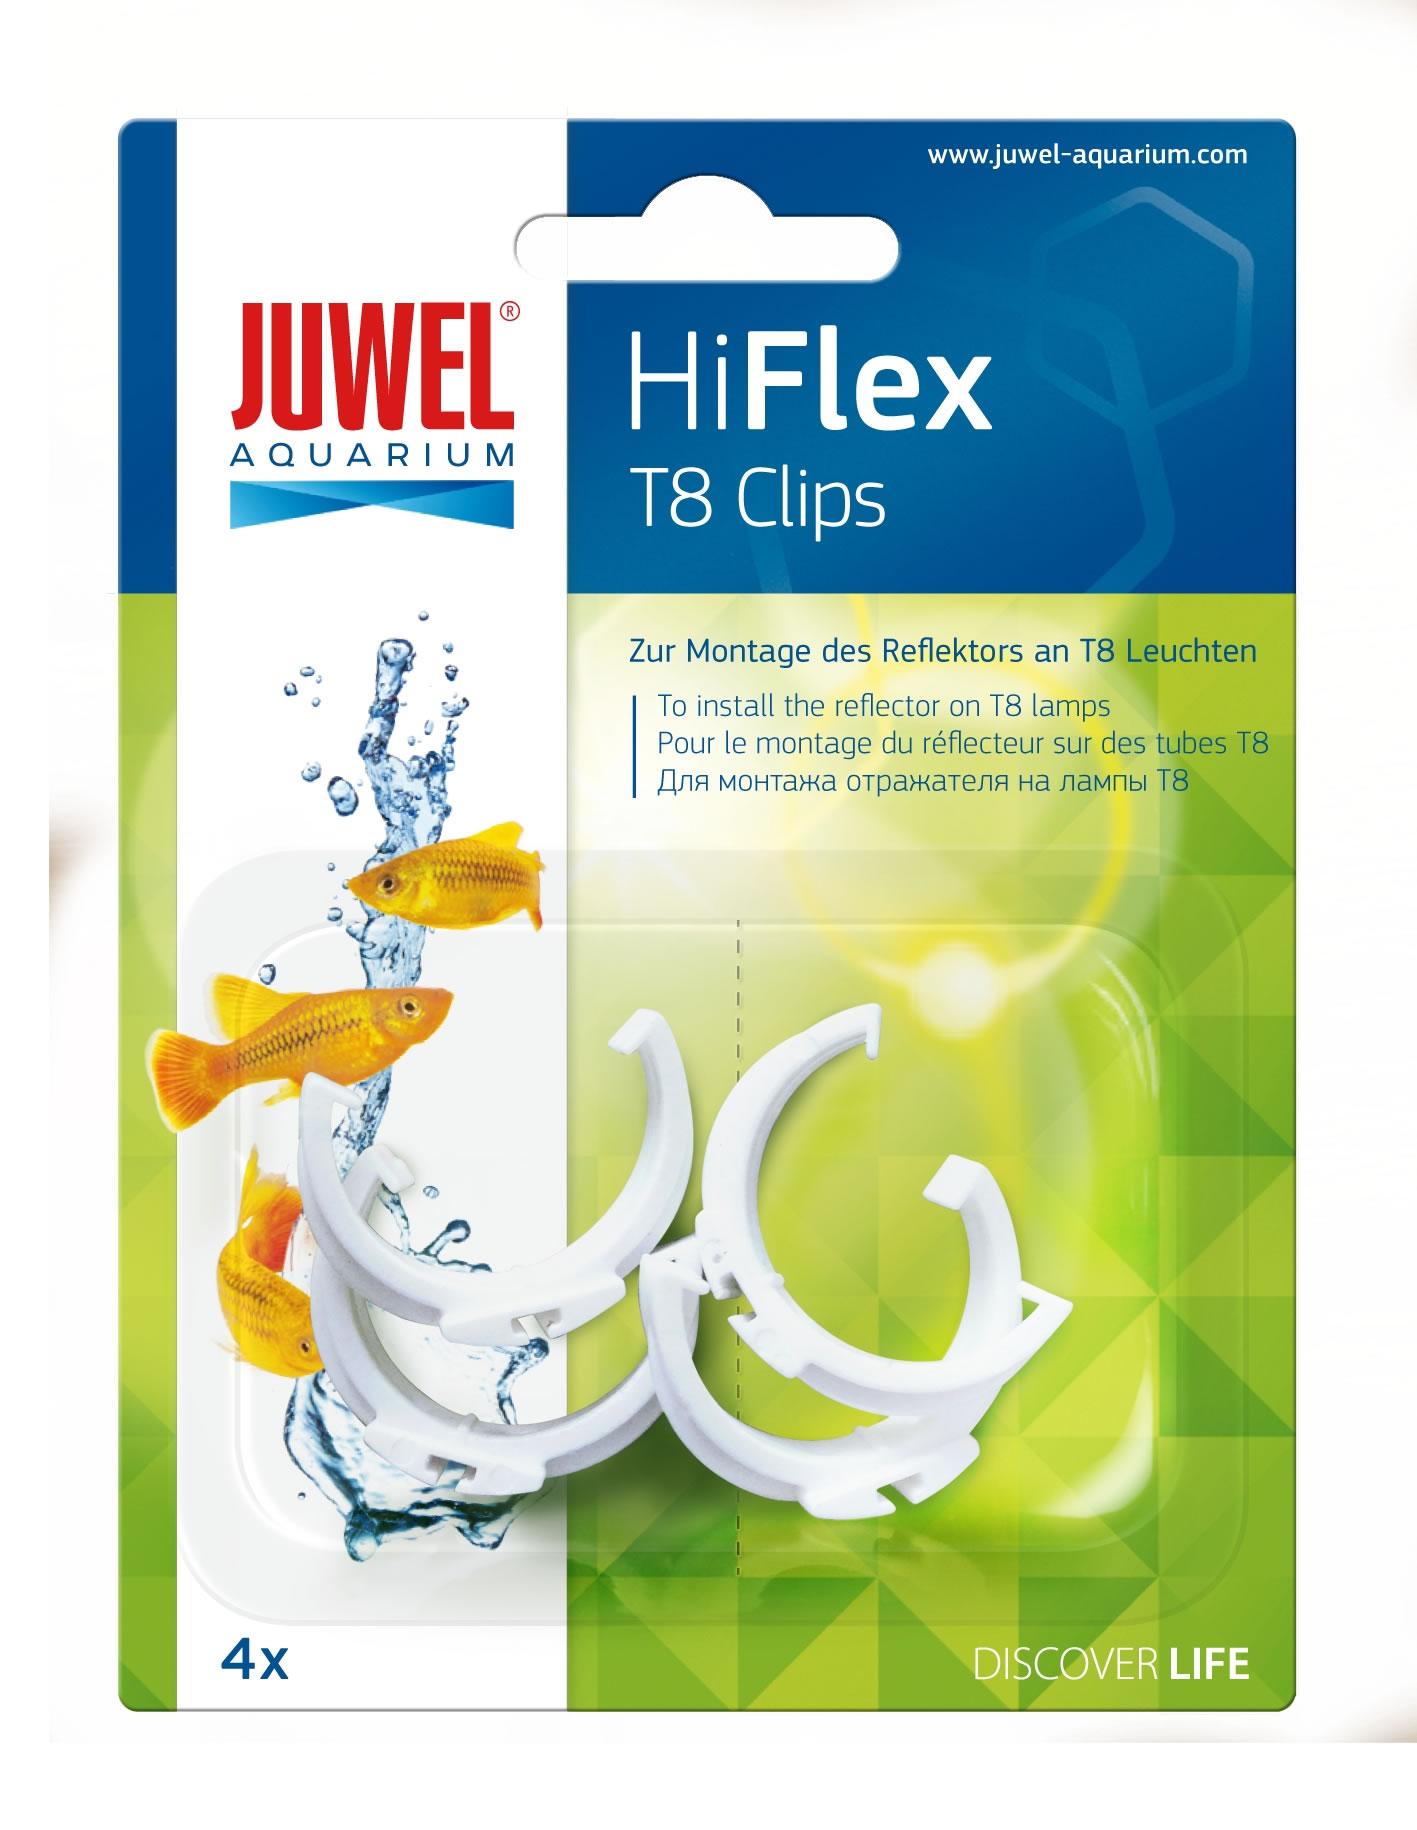 juwel reflektor clips f r t8 hiflex reflektoren 4 st ck 26 mm. Black Bedroom Furniture Sets. Home Design Ideas